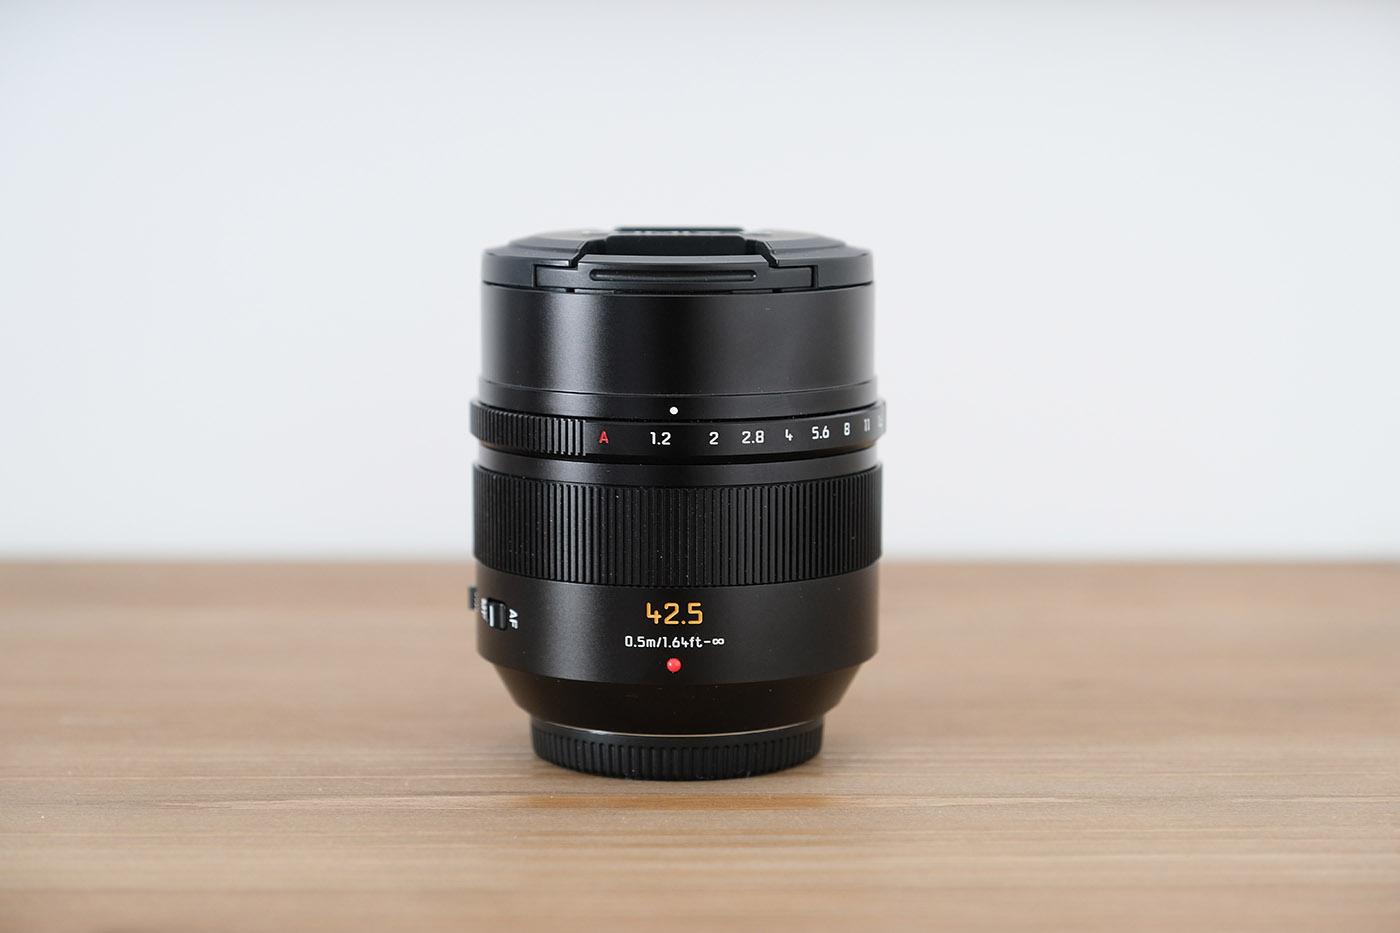 Panasonic Leica 42.5 mm f1.2